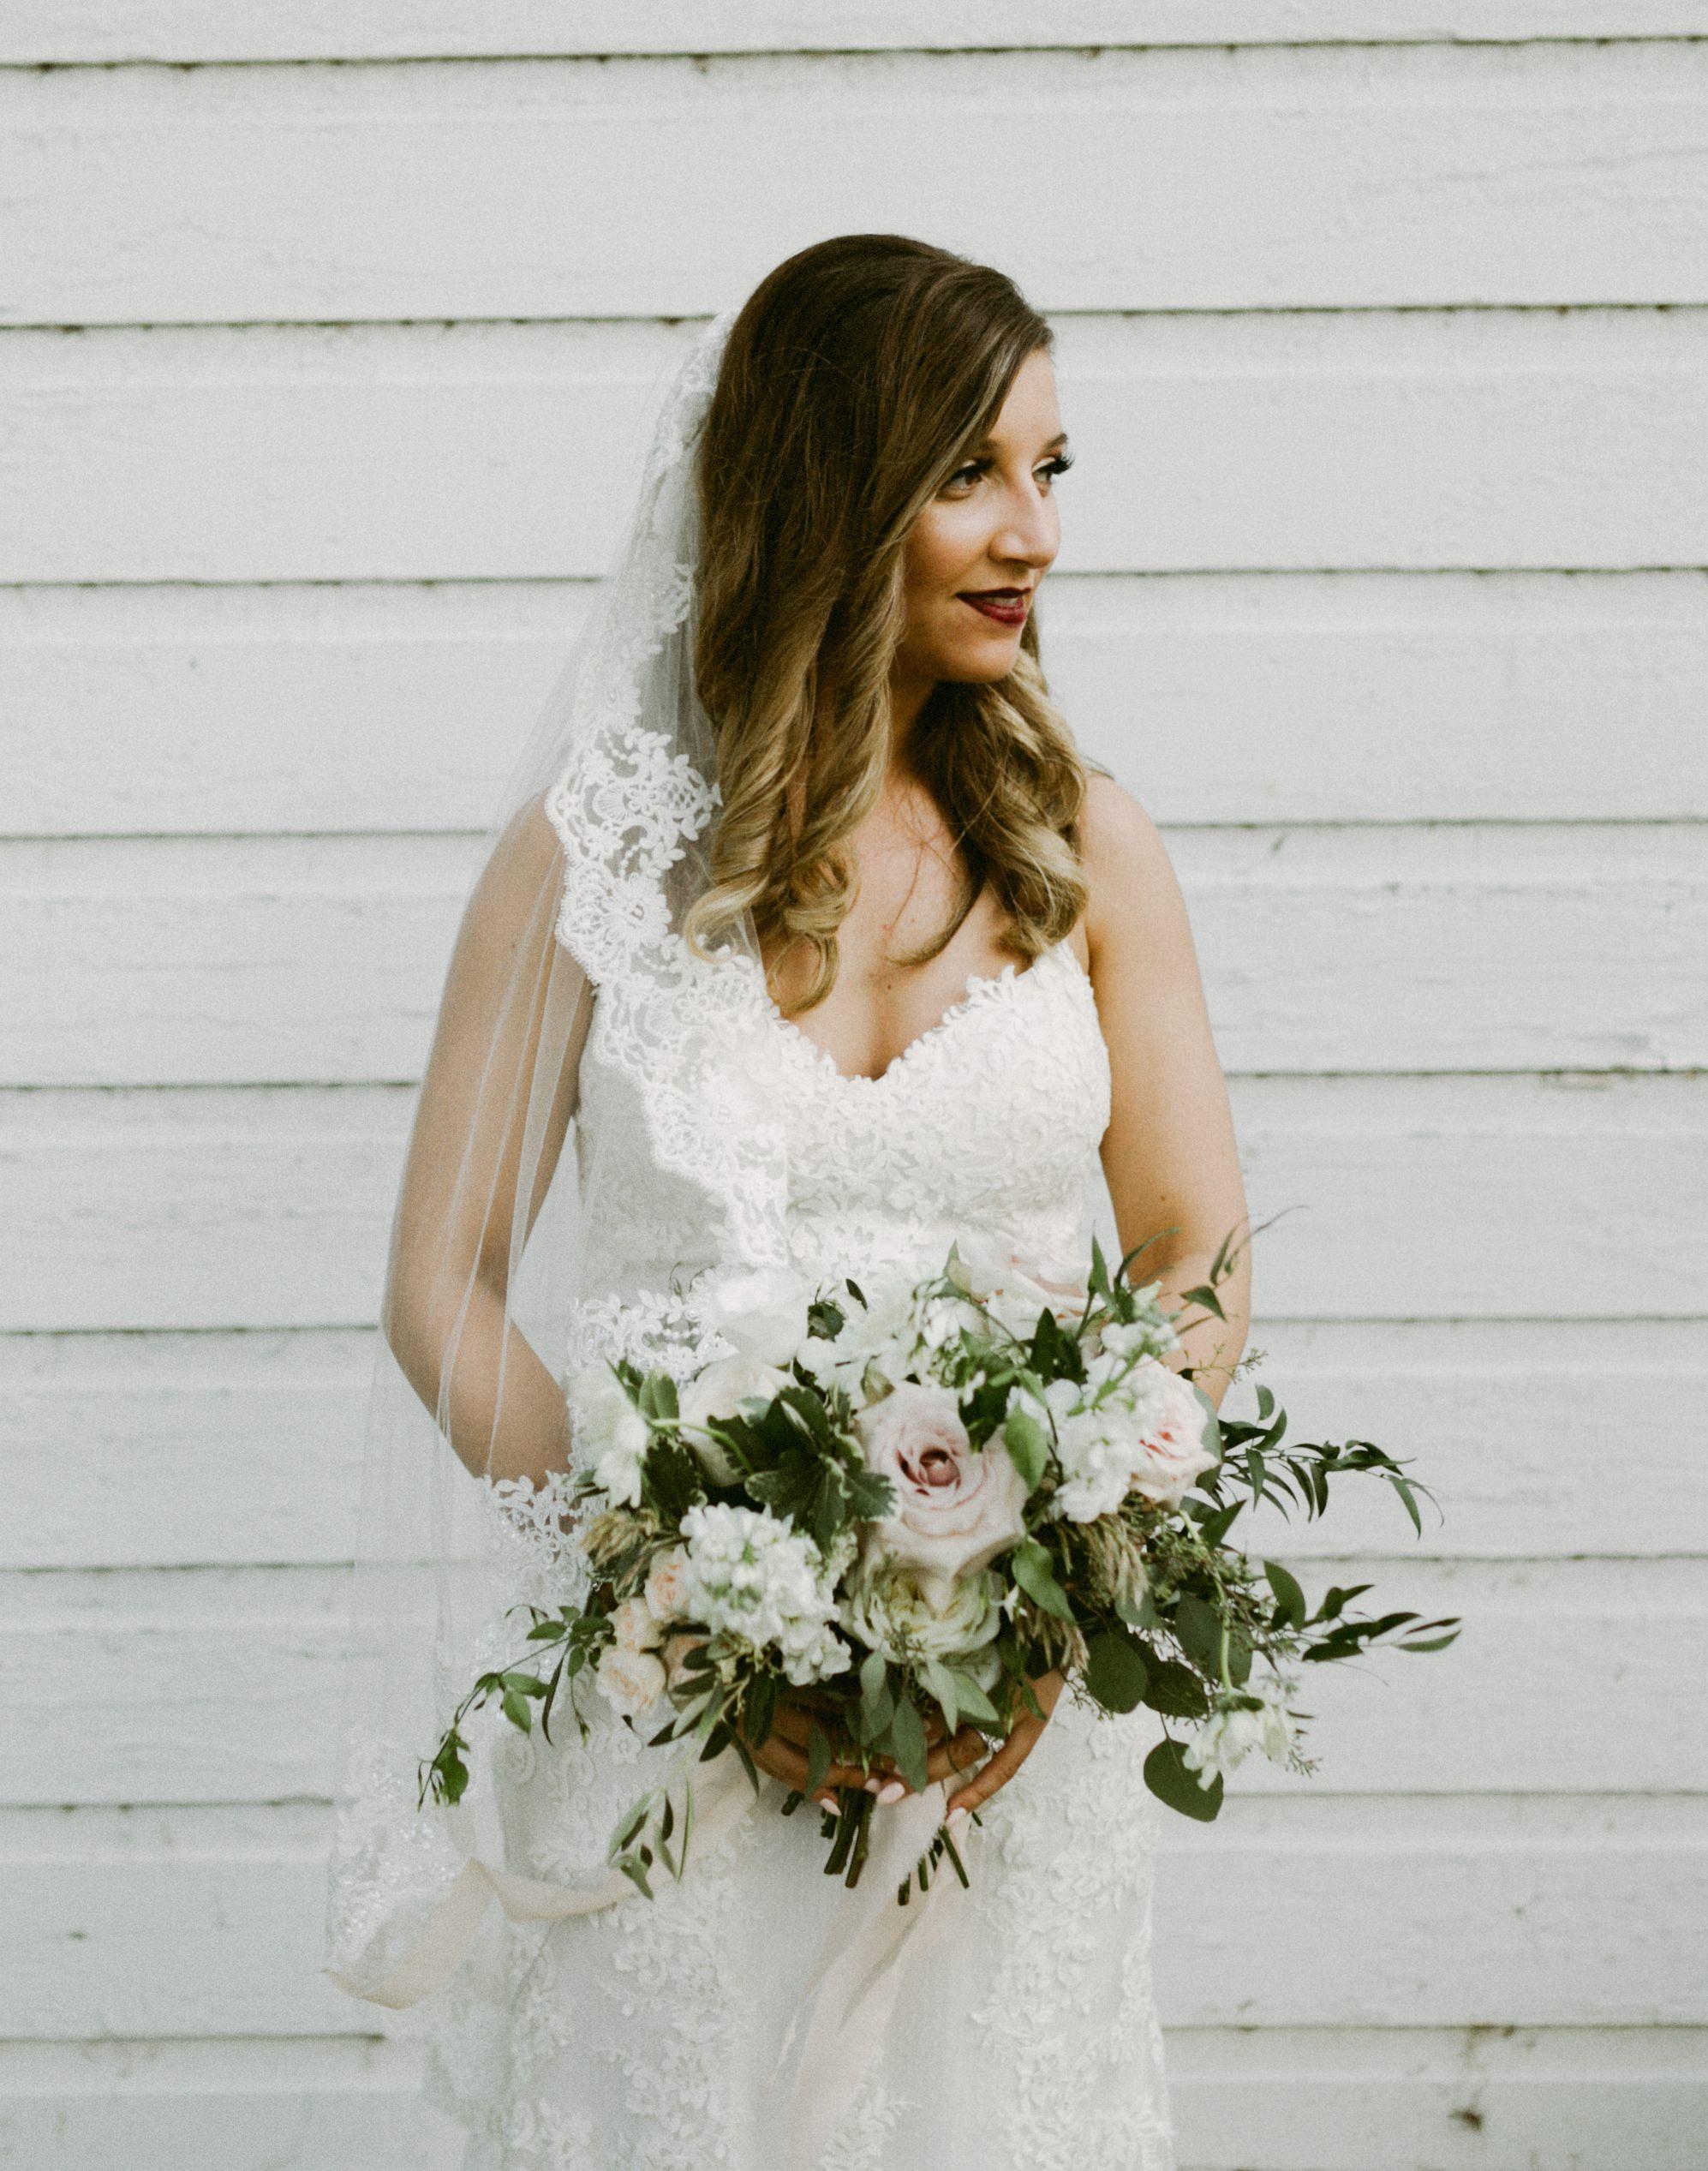 DanielaKamal_WEDDING_DOCTORSHOUSE_bisouseventsYAS-387ASE.jpg